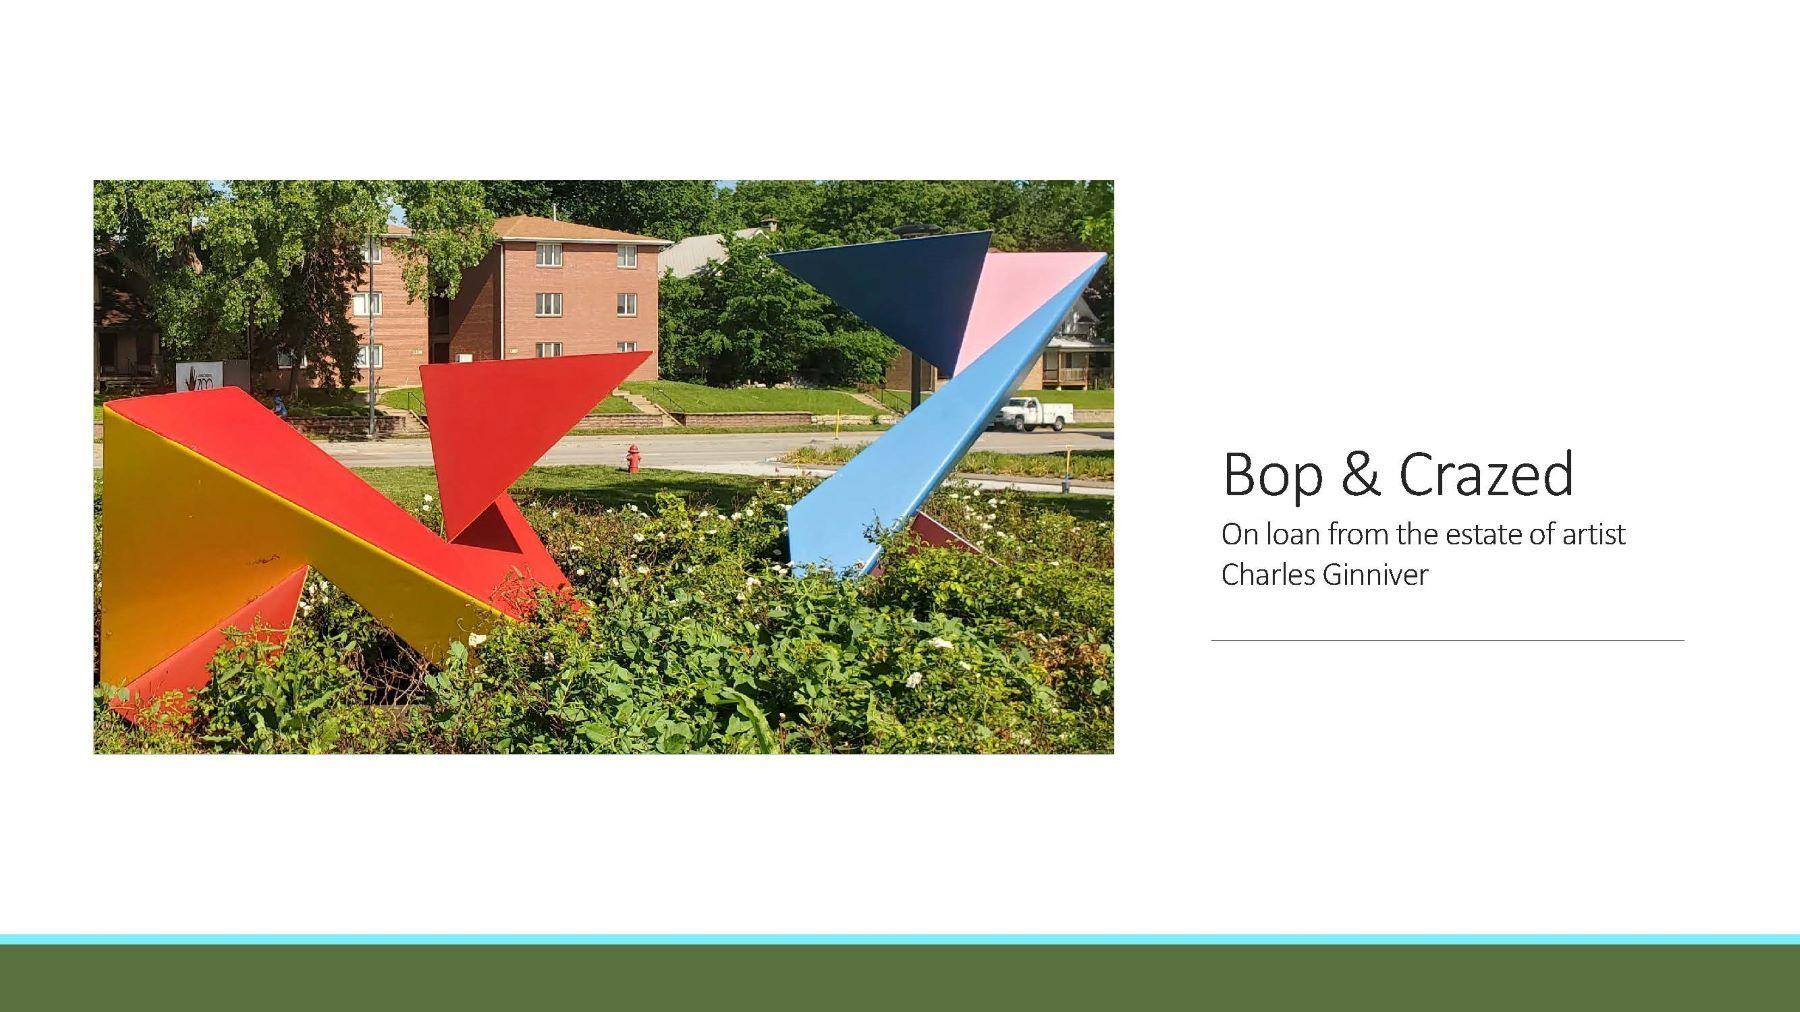 Bop & Crazed / Charles Ginniver